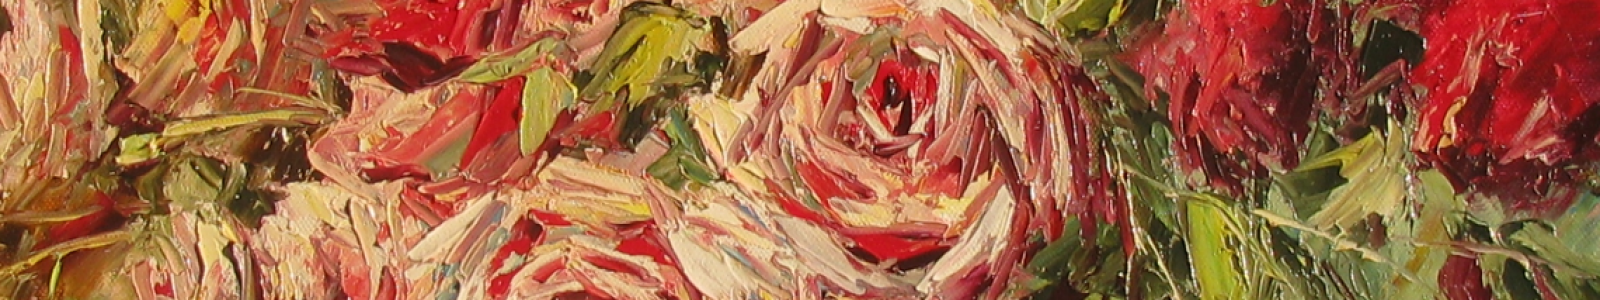 Gallery Painter Svetlana Kruglov